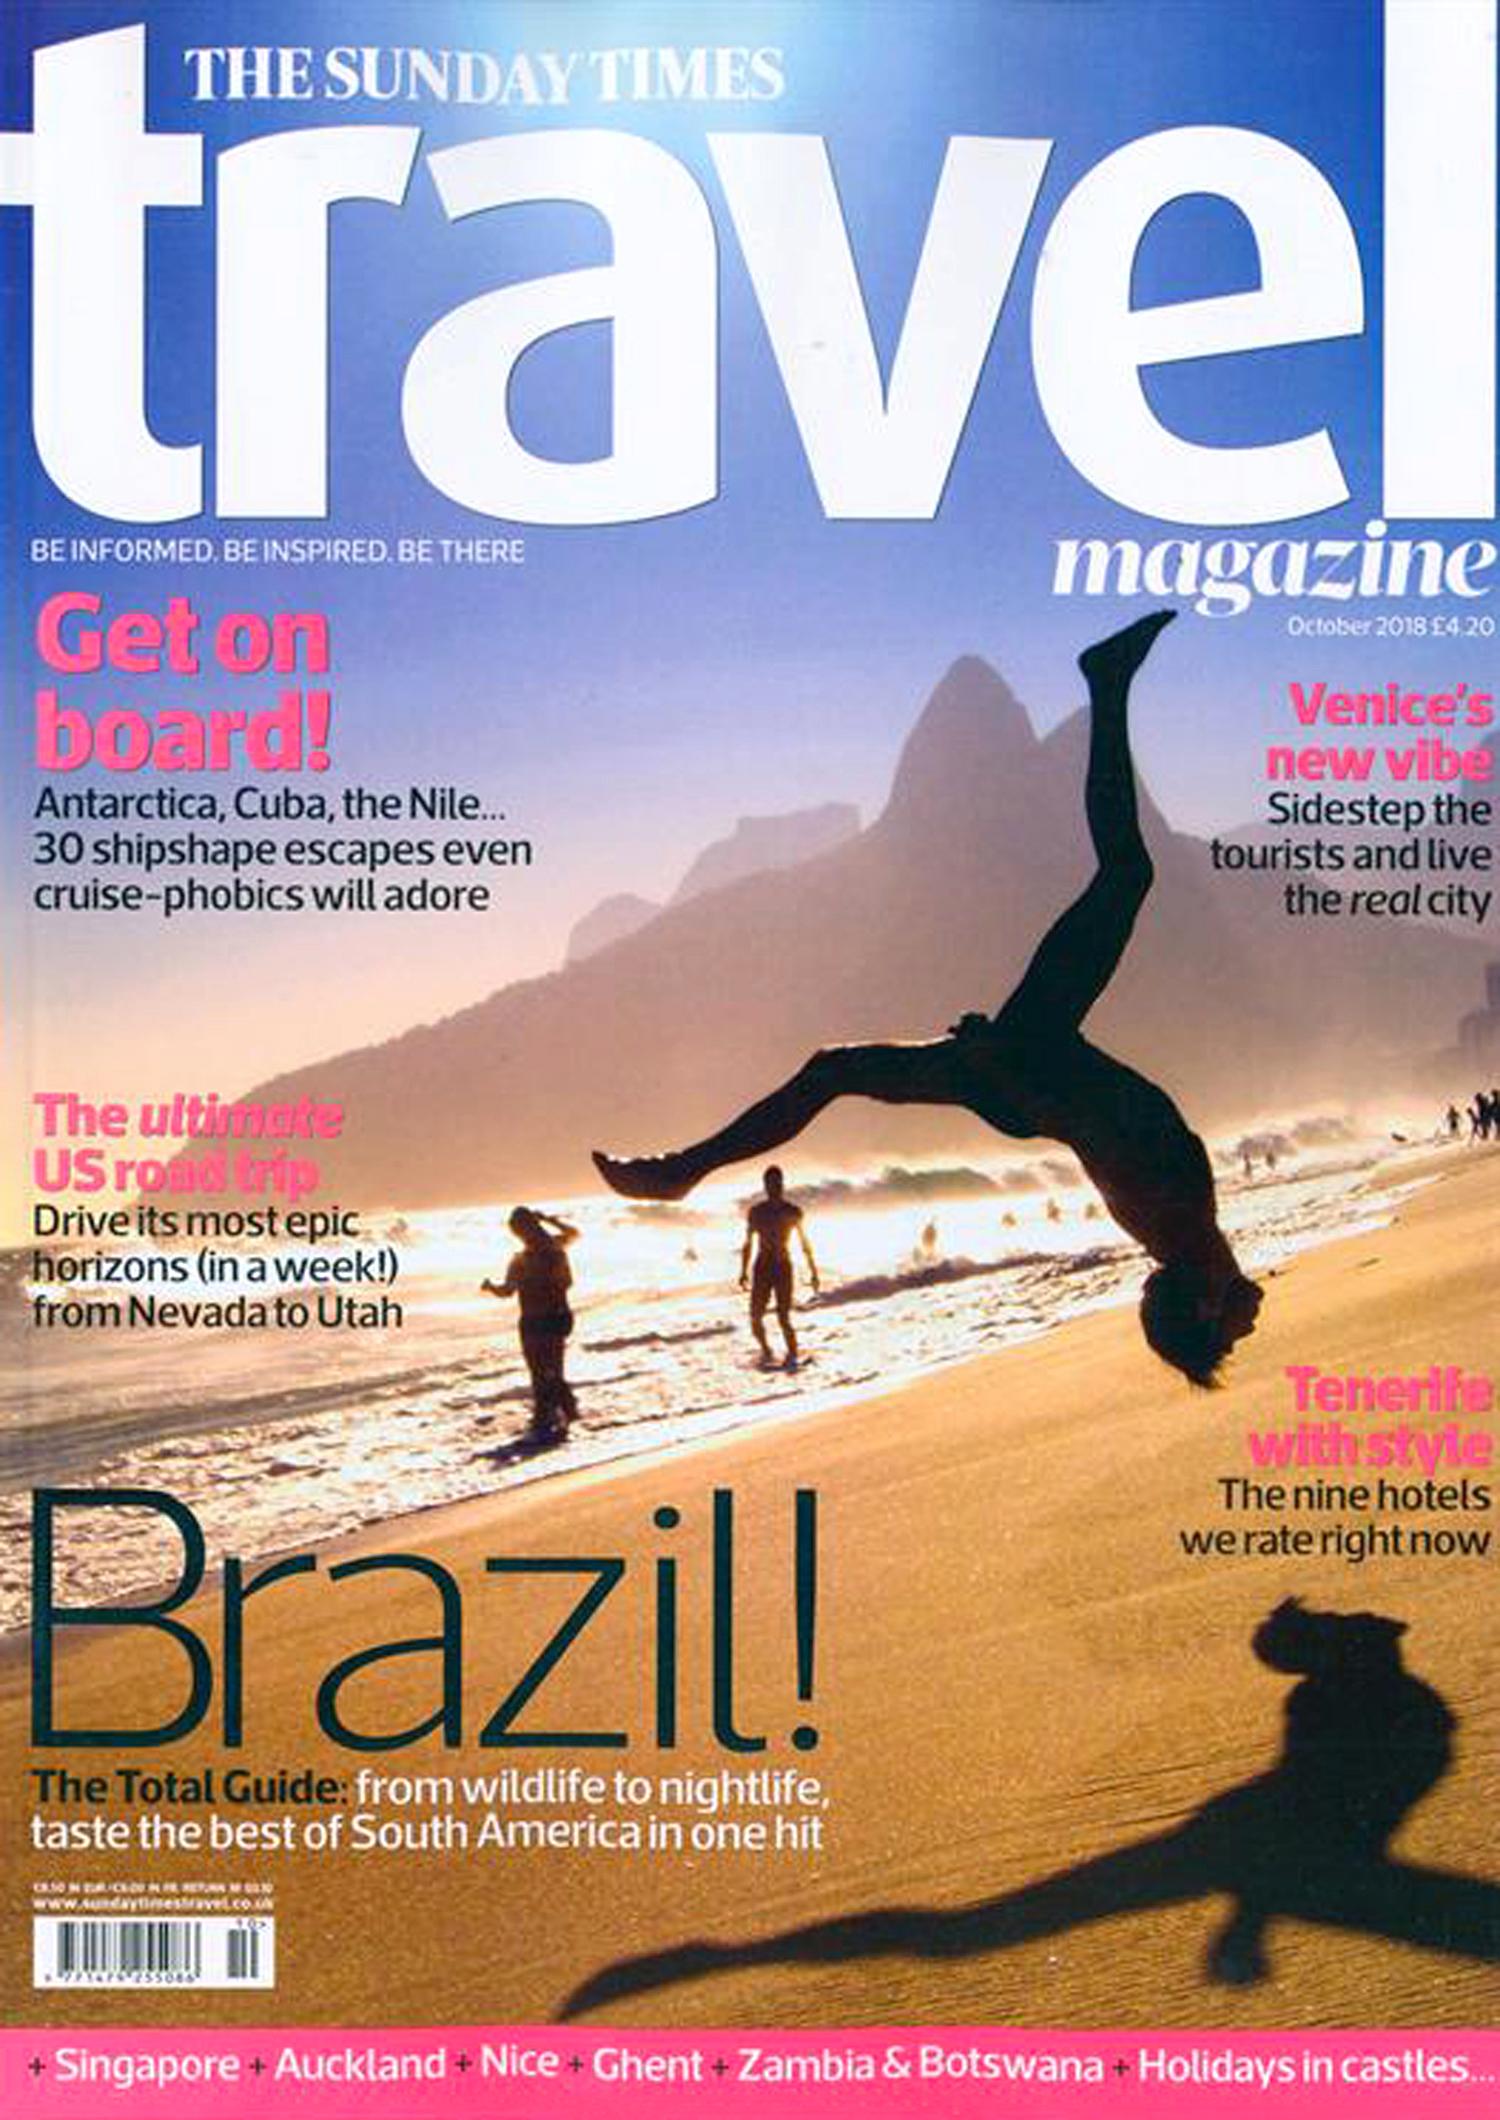 Destaque na Revista The Sunday Times Travel Magazine